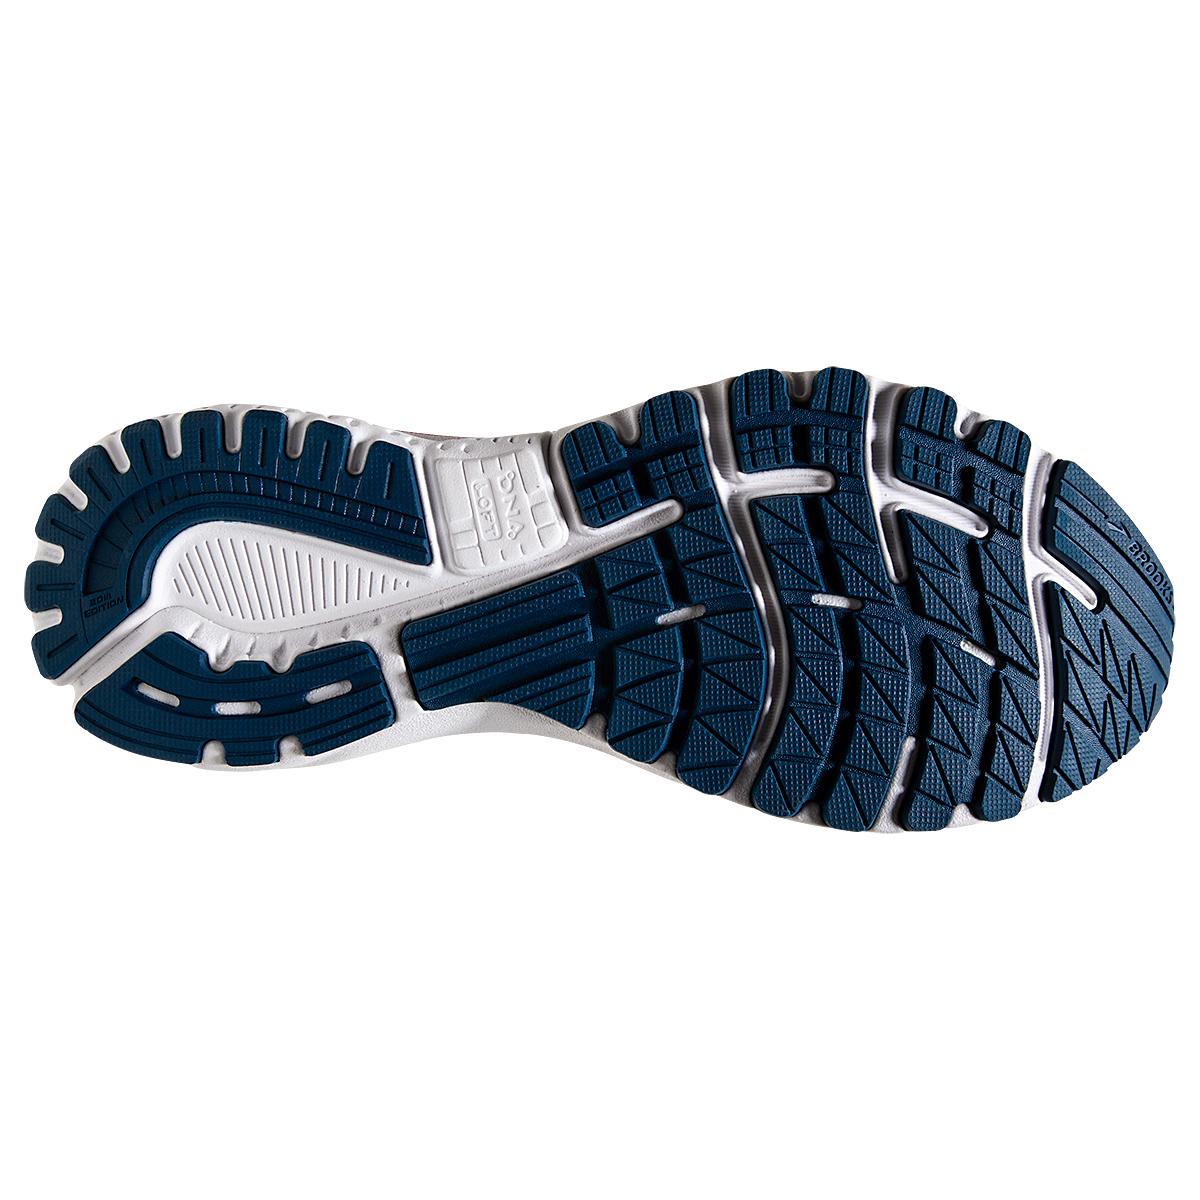 Men's Brooks Adrenaline GTS 20 Running Shoe - Color: Gibraltar/Red/White - Size: 7 - Width: Regular, Gibraltar/Red/White, large, image 3